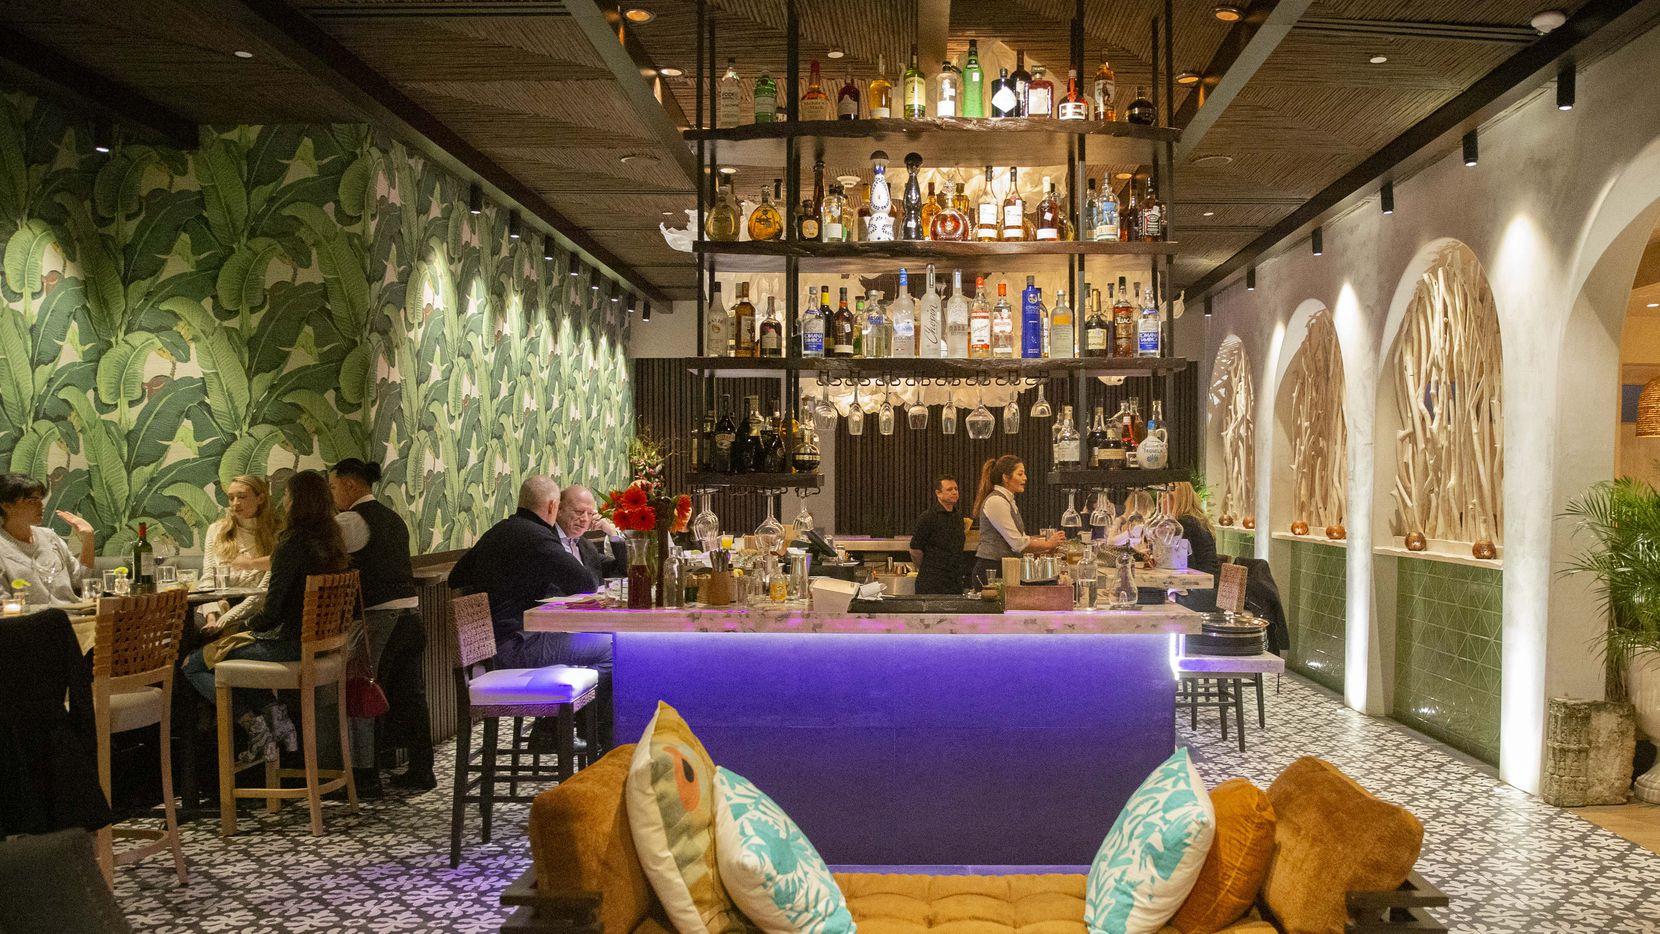 The bar at Tulum